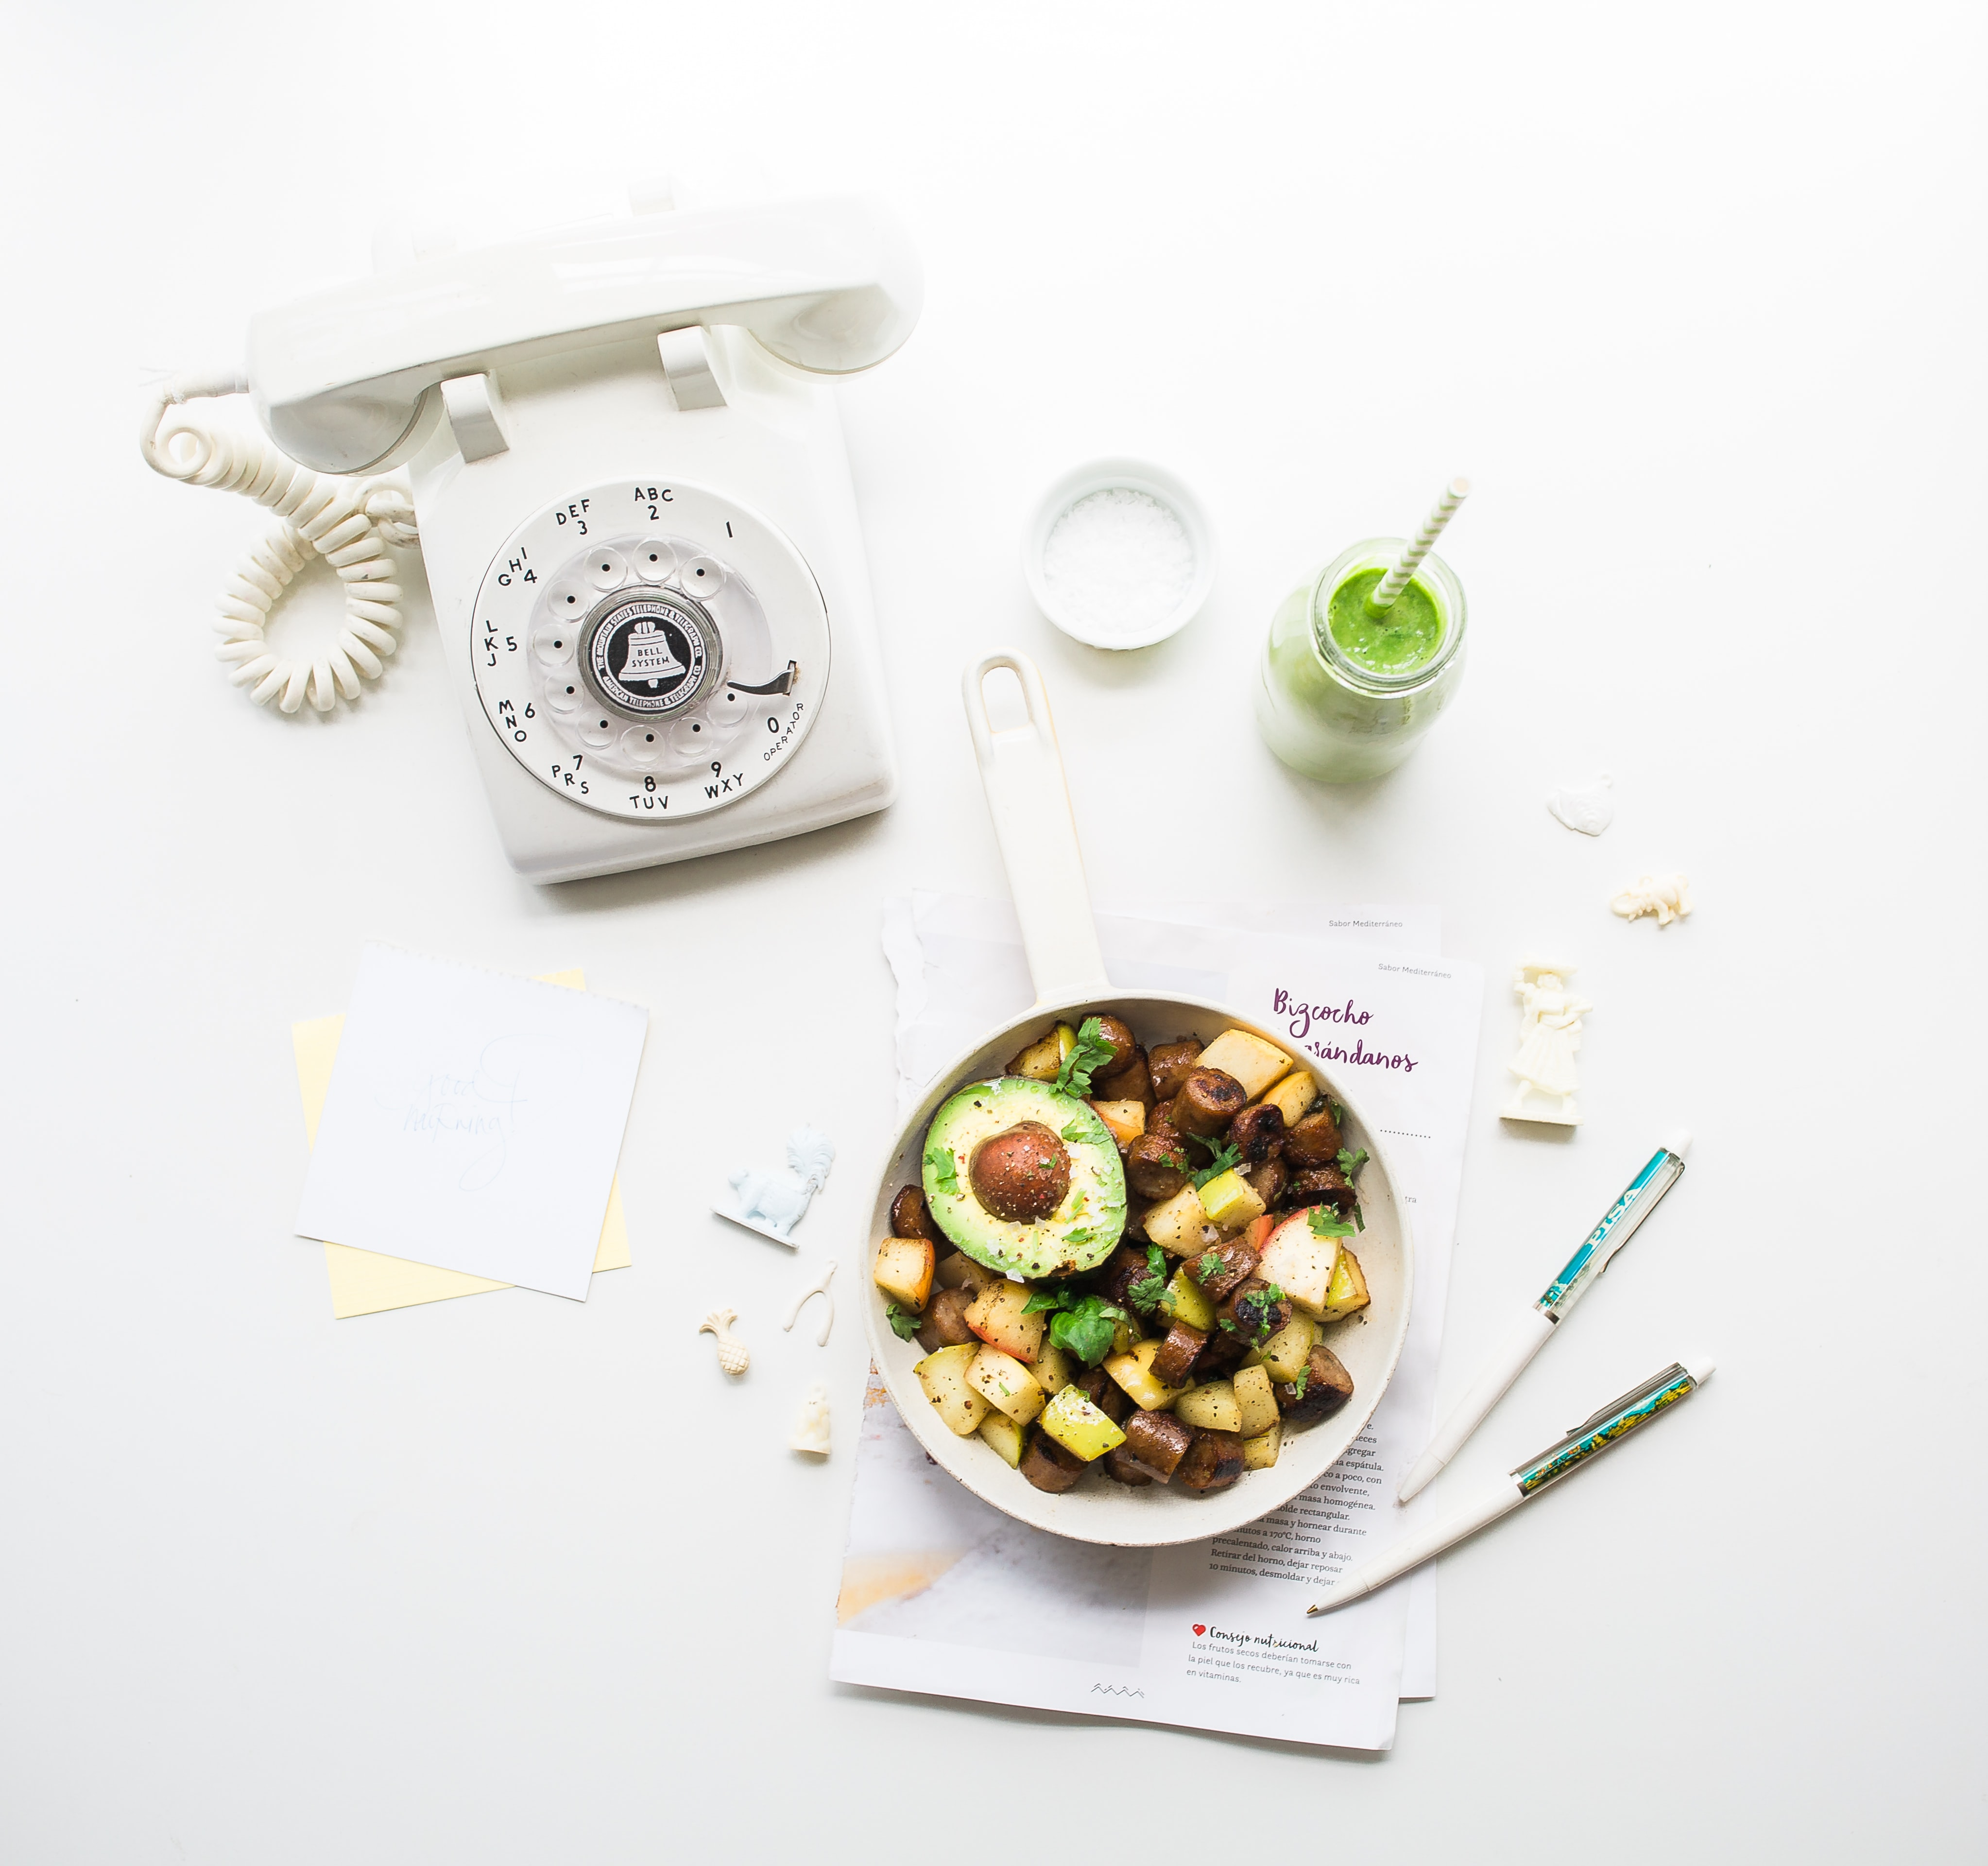 sliced avocado fruit inside bowl near rotary phone beside jar